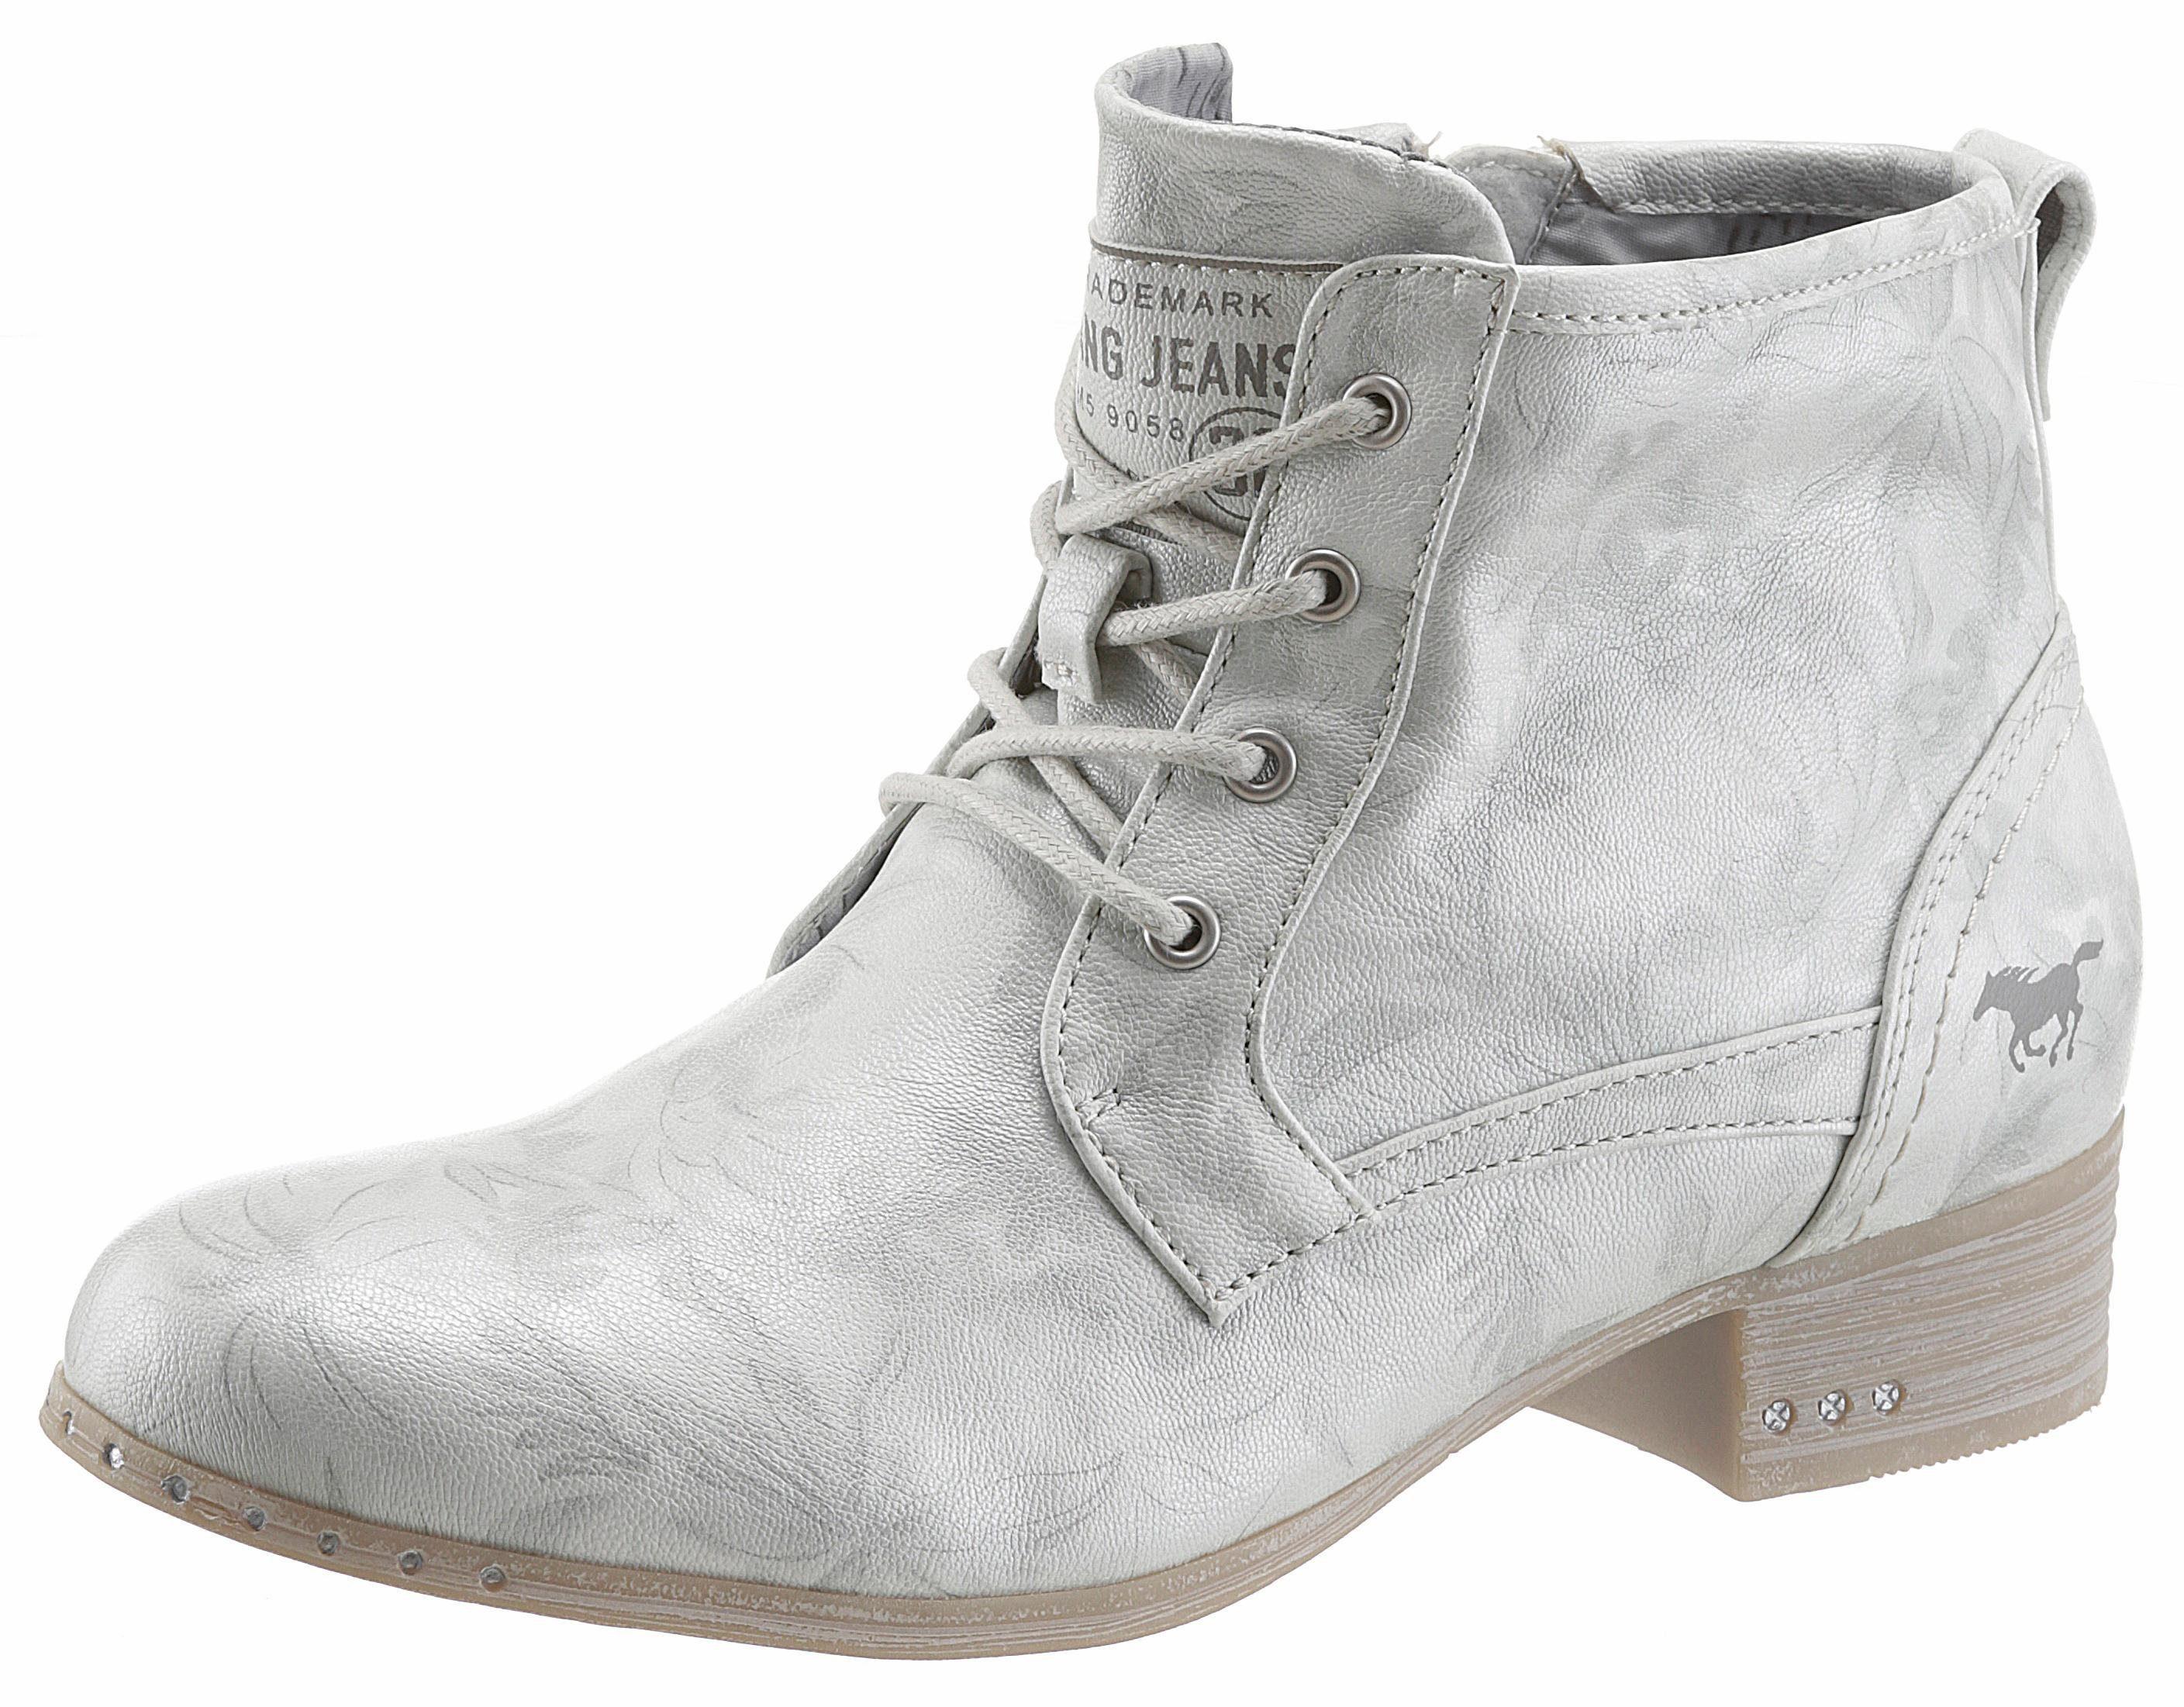 Mustang Shoes Schnürstiefelette, im coolen Used Look online kaufen  offwhite